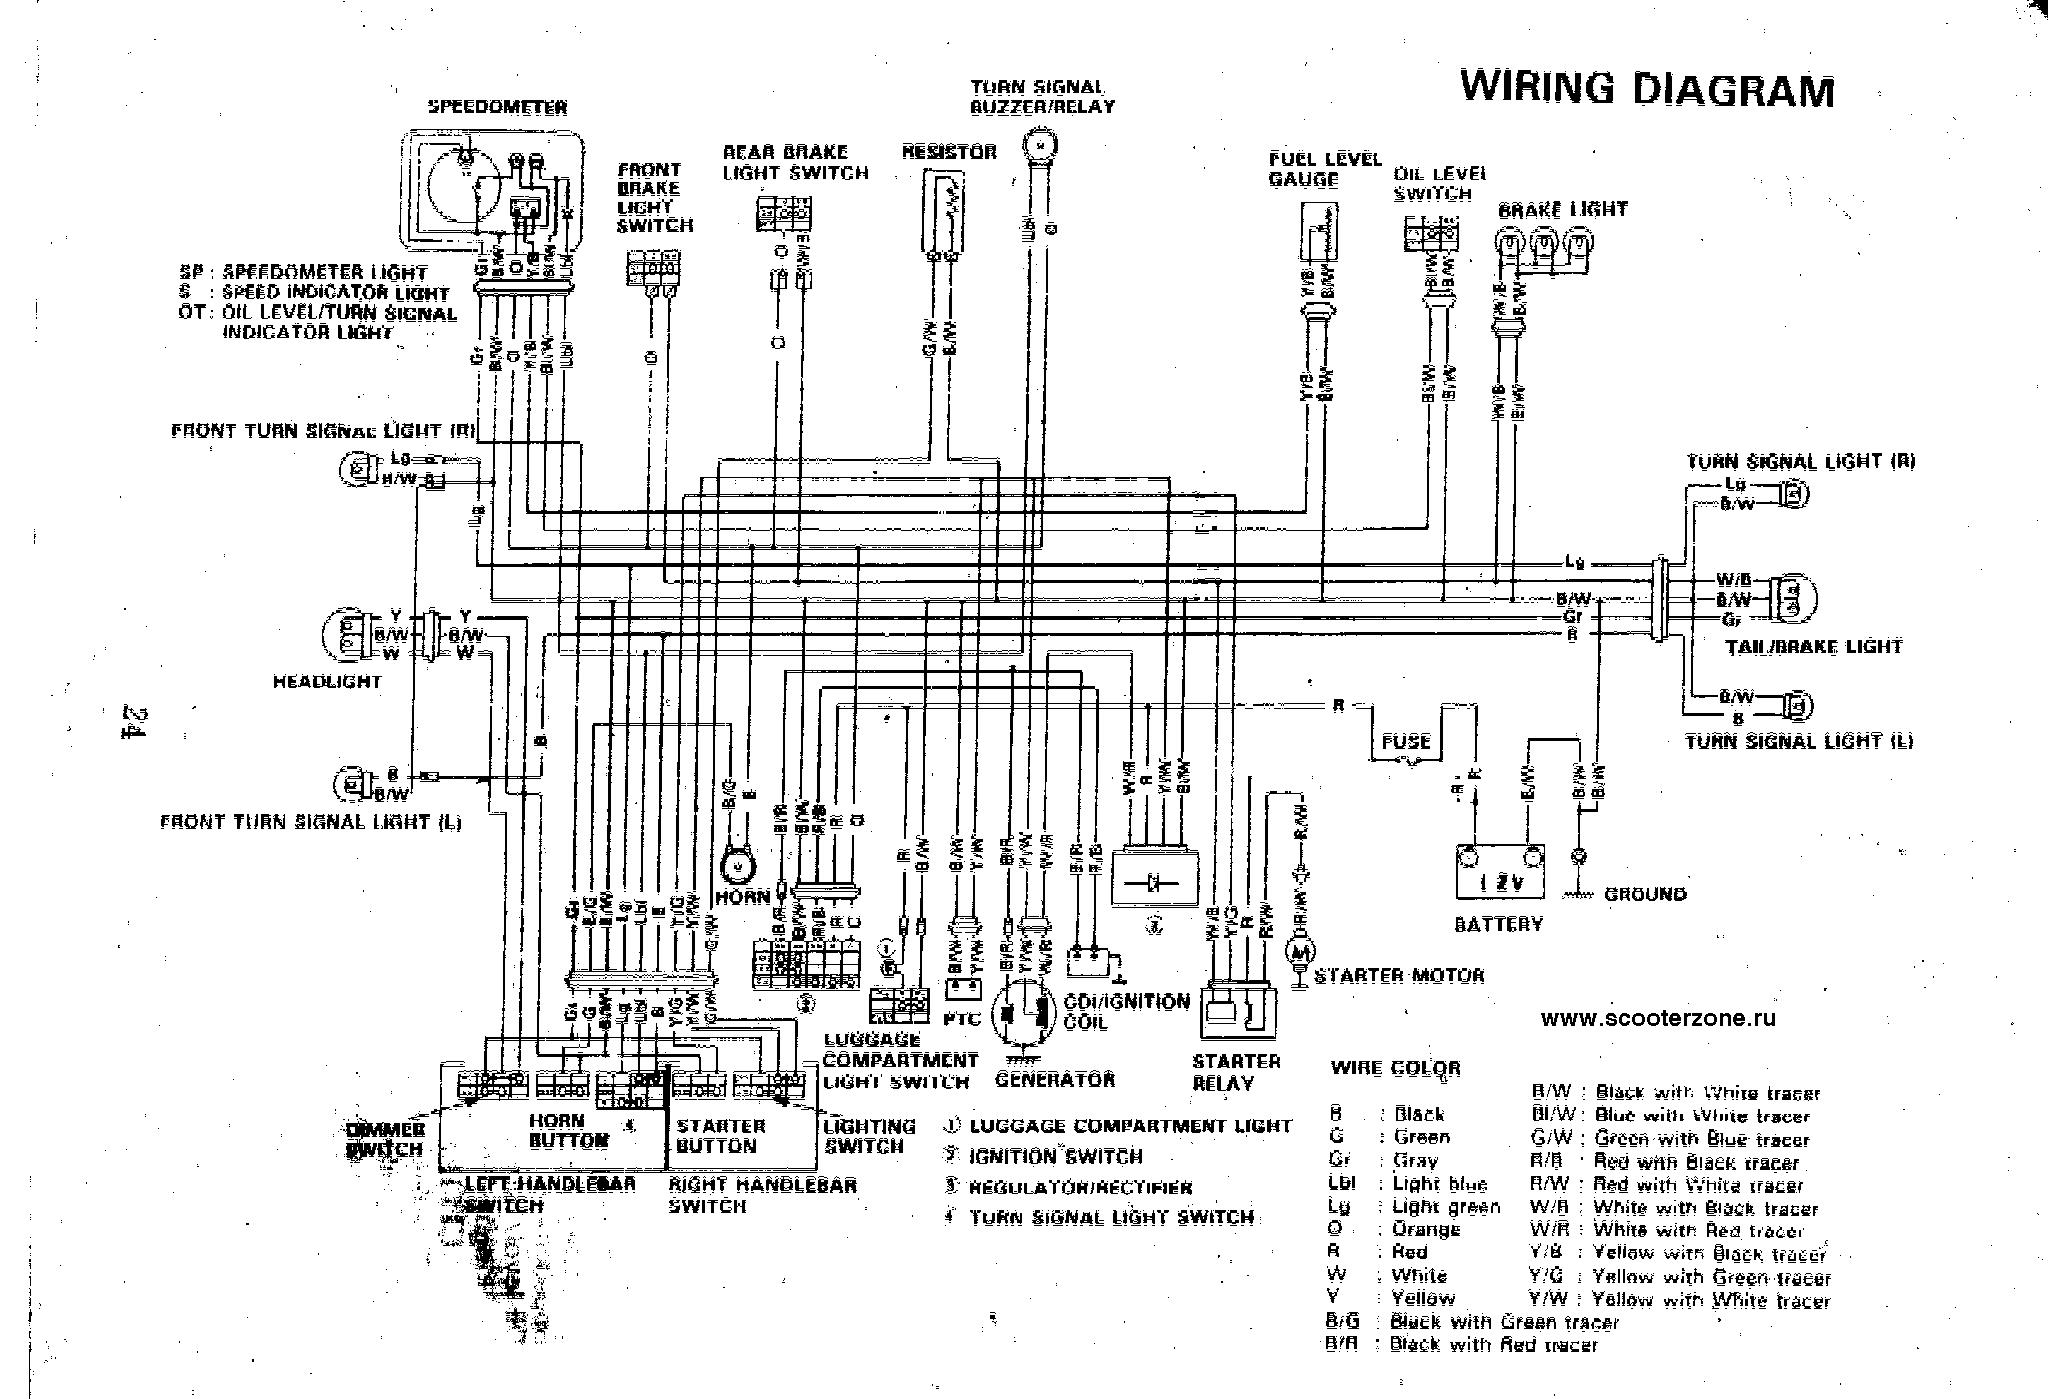 схема проводки скутера сузуки сепия